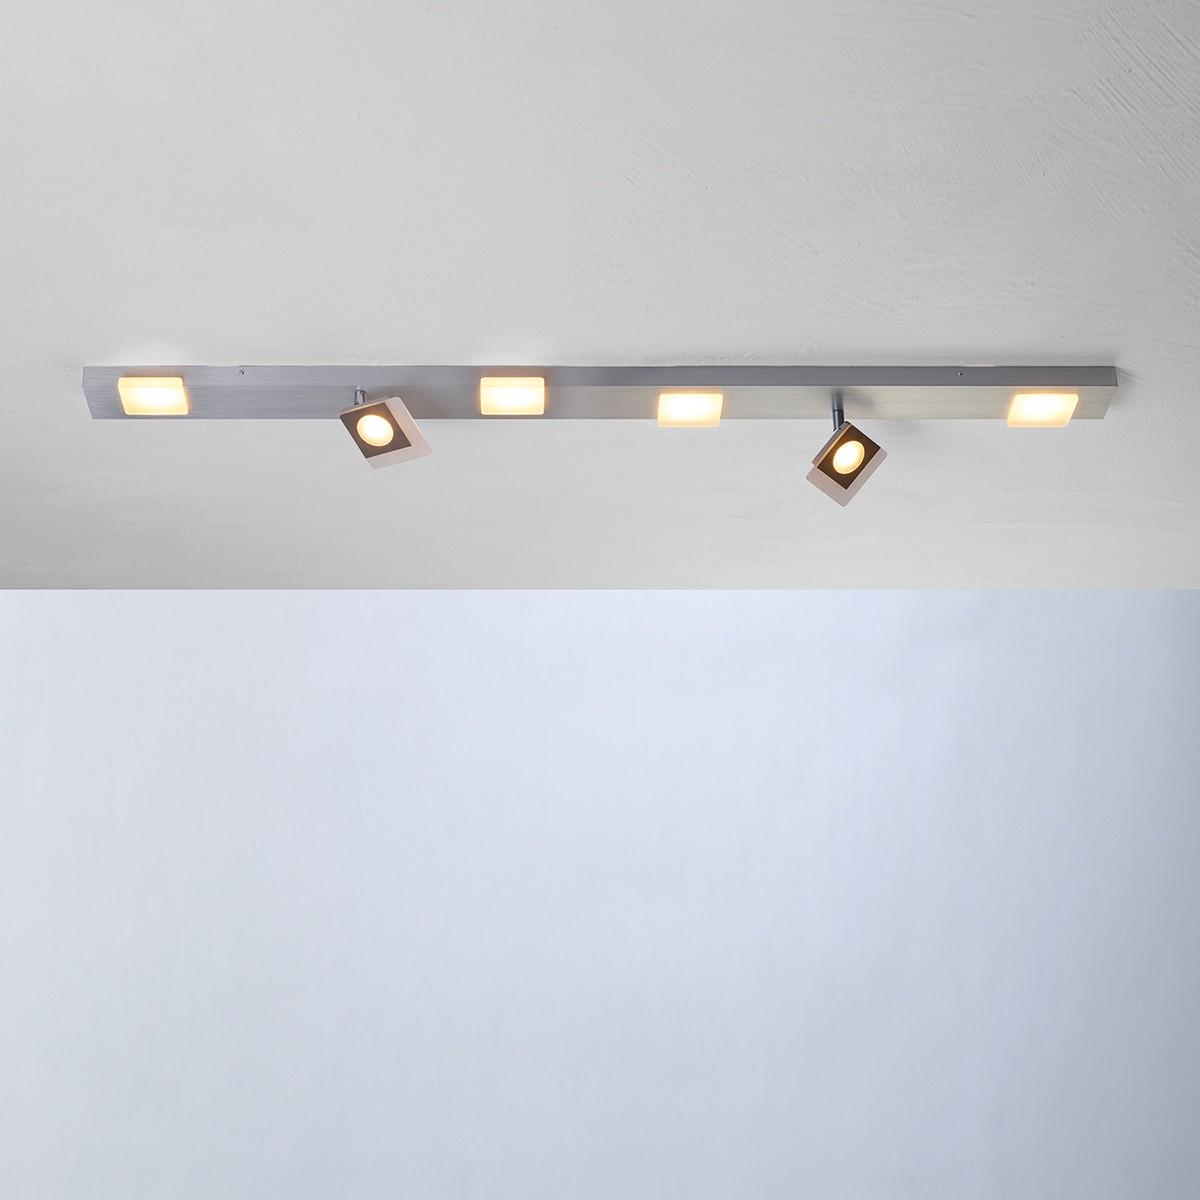 Bopp Session LED Deckenleuchte, 6-flg., Aluminium geschliffen